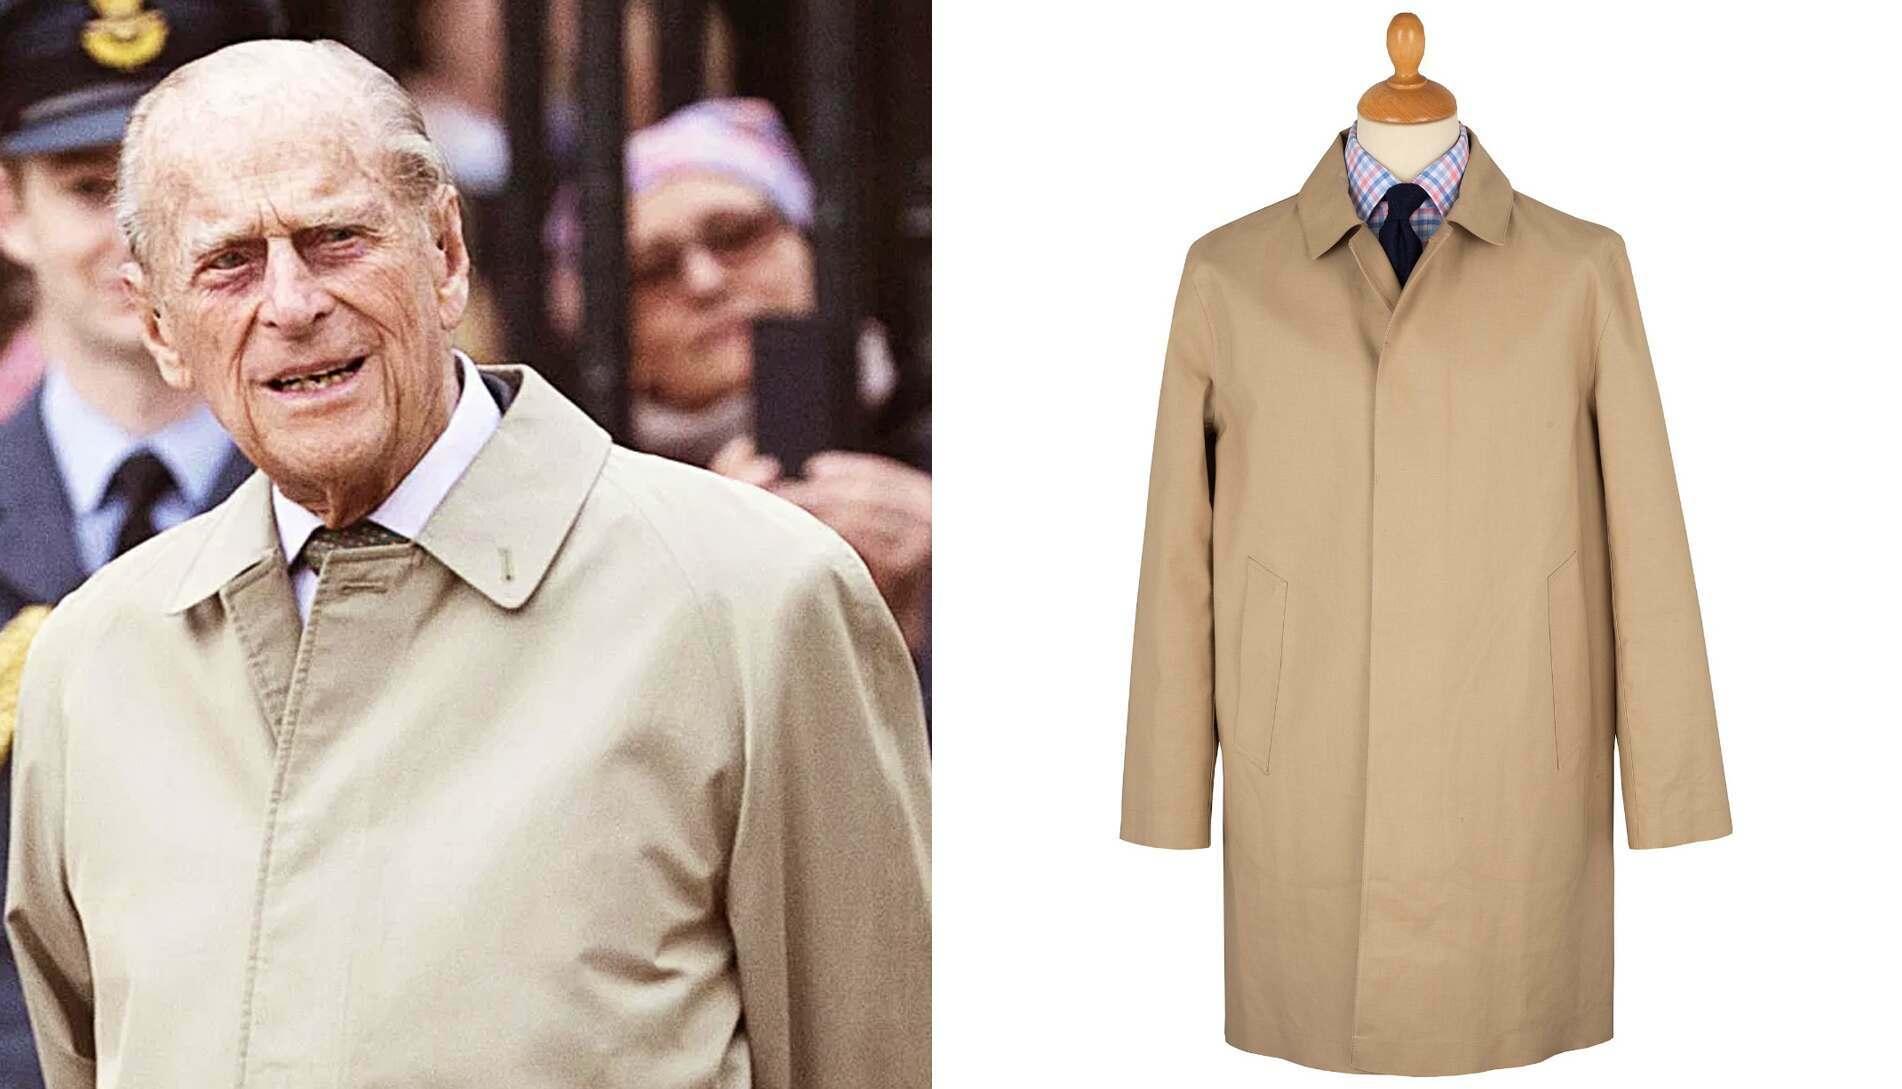 The Duke of Edinburgh's trusty camel raincoat, another favourite, worn over decades.